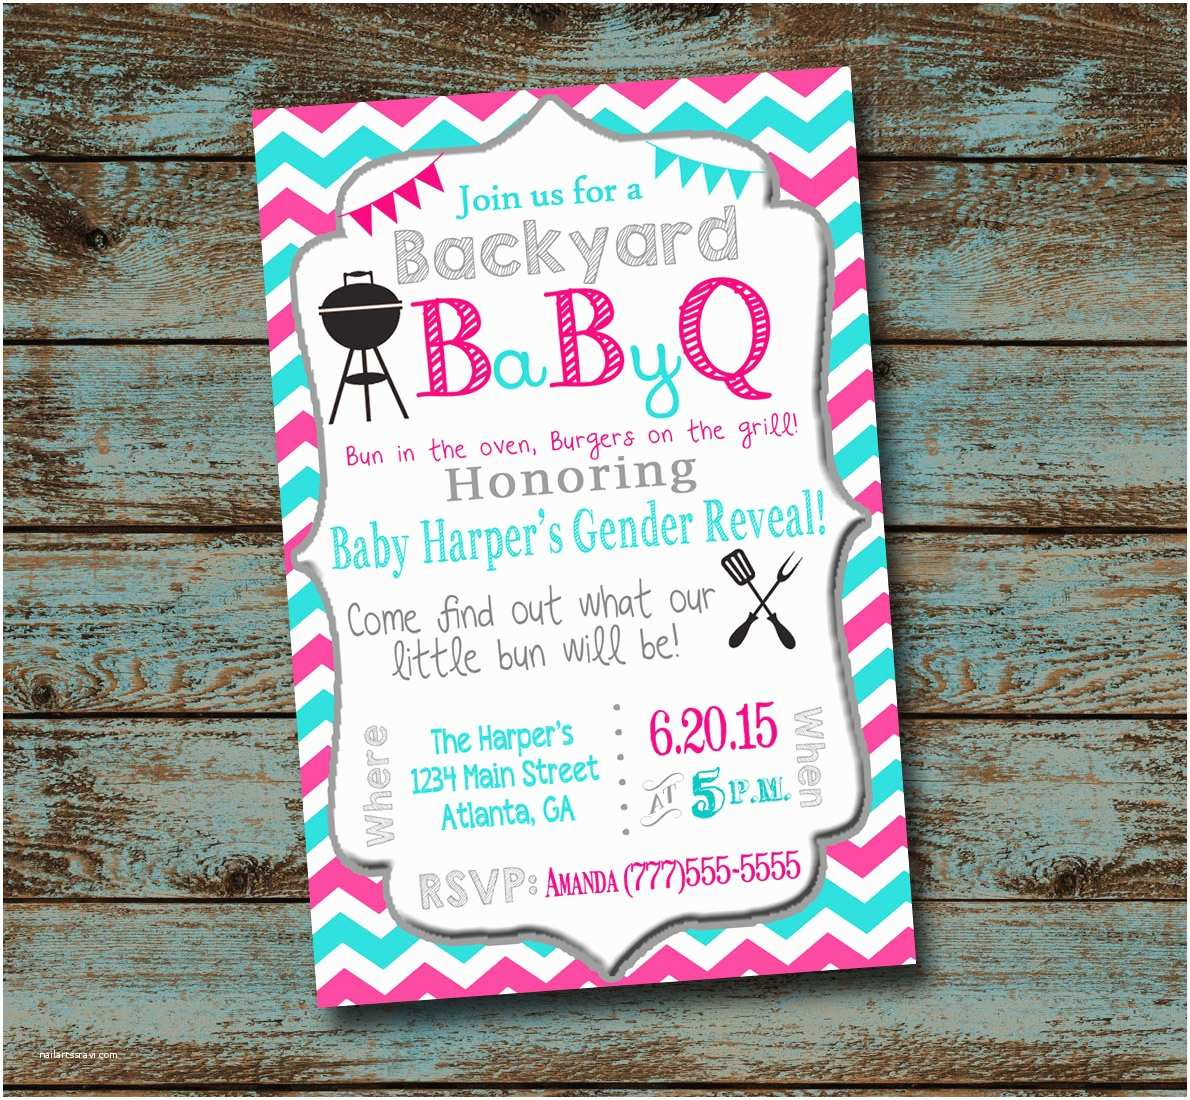 Bbq Baby Shower Invitations Baby Shower Bbq Invitations – Gangcraft